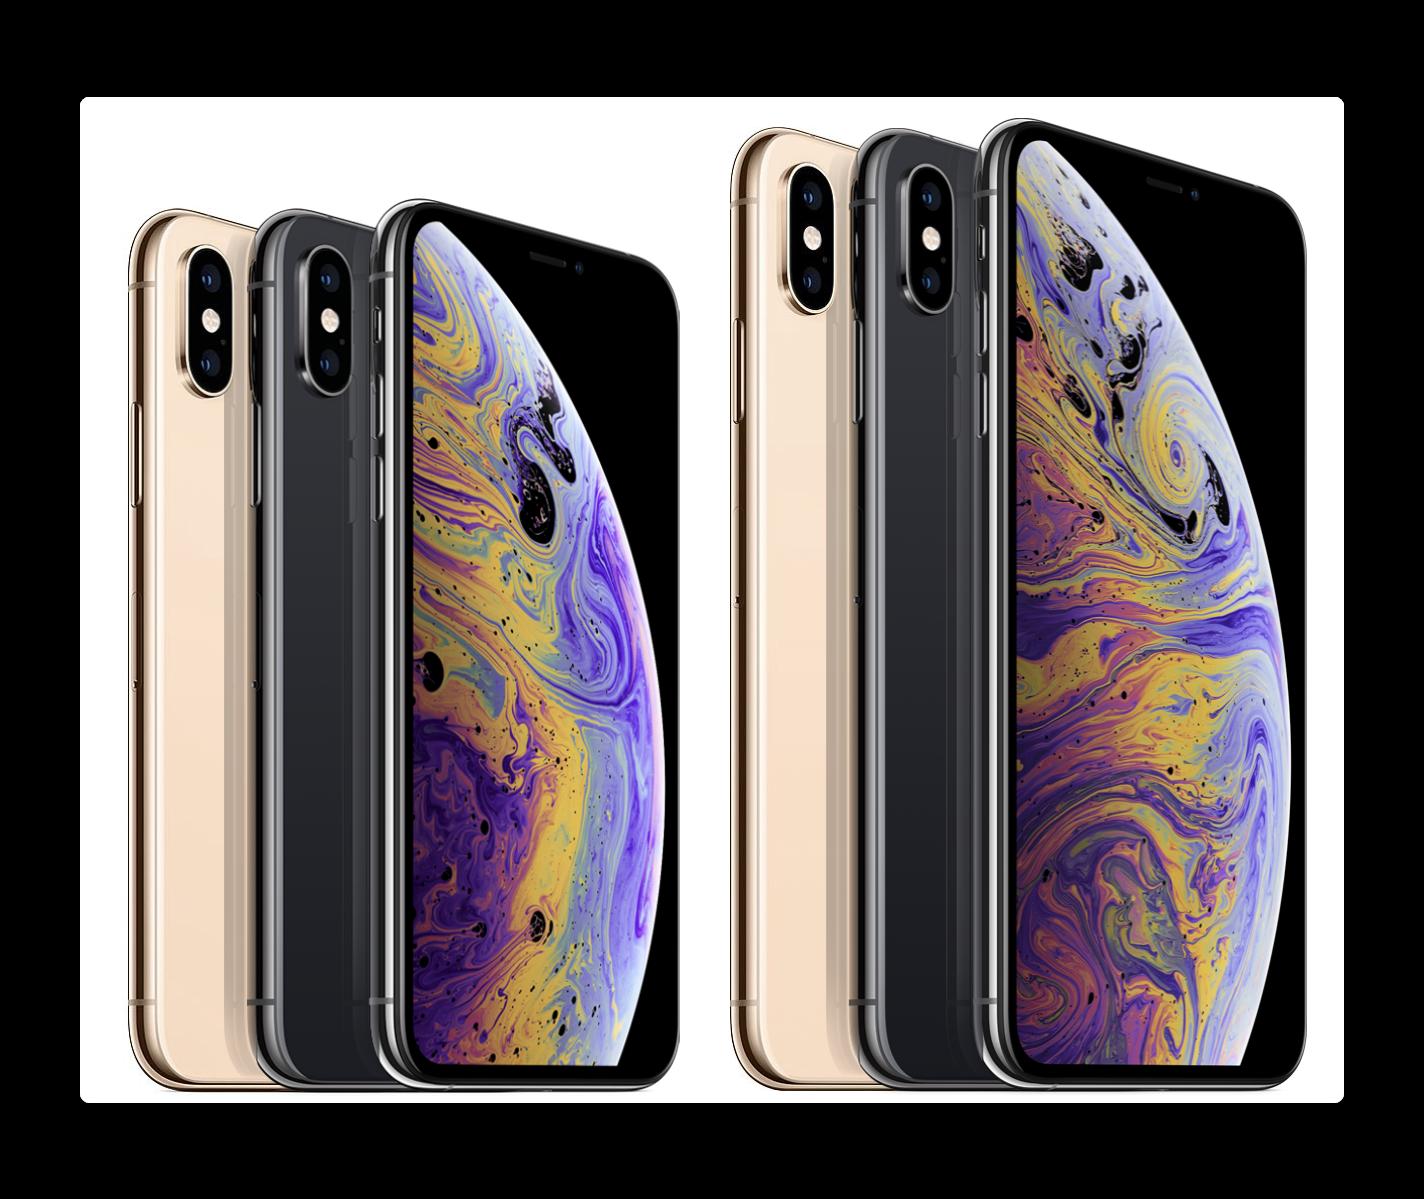 Apple、iPhone XSとiPhone XS Maxの発売は成功したようです